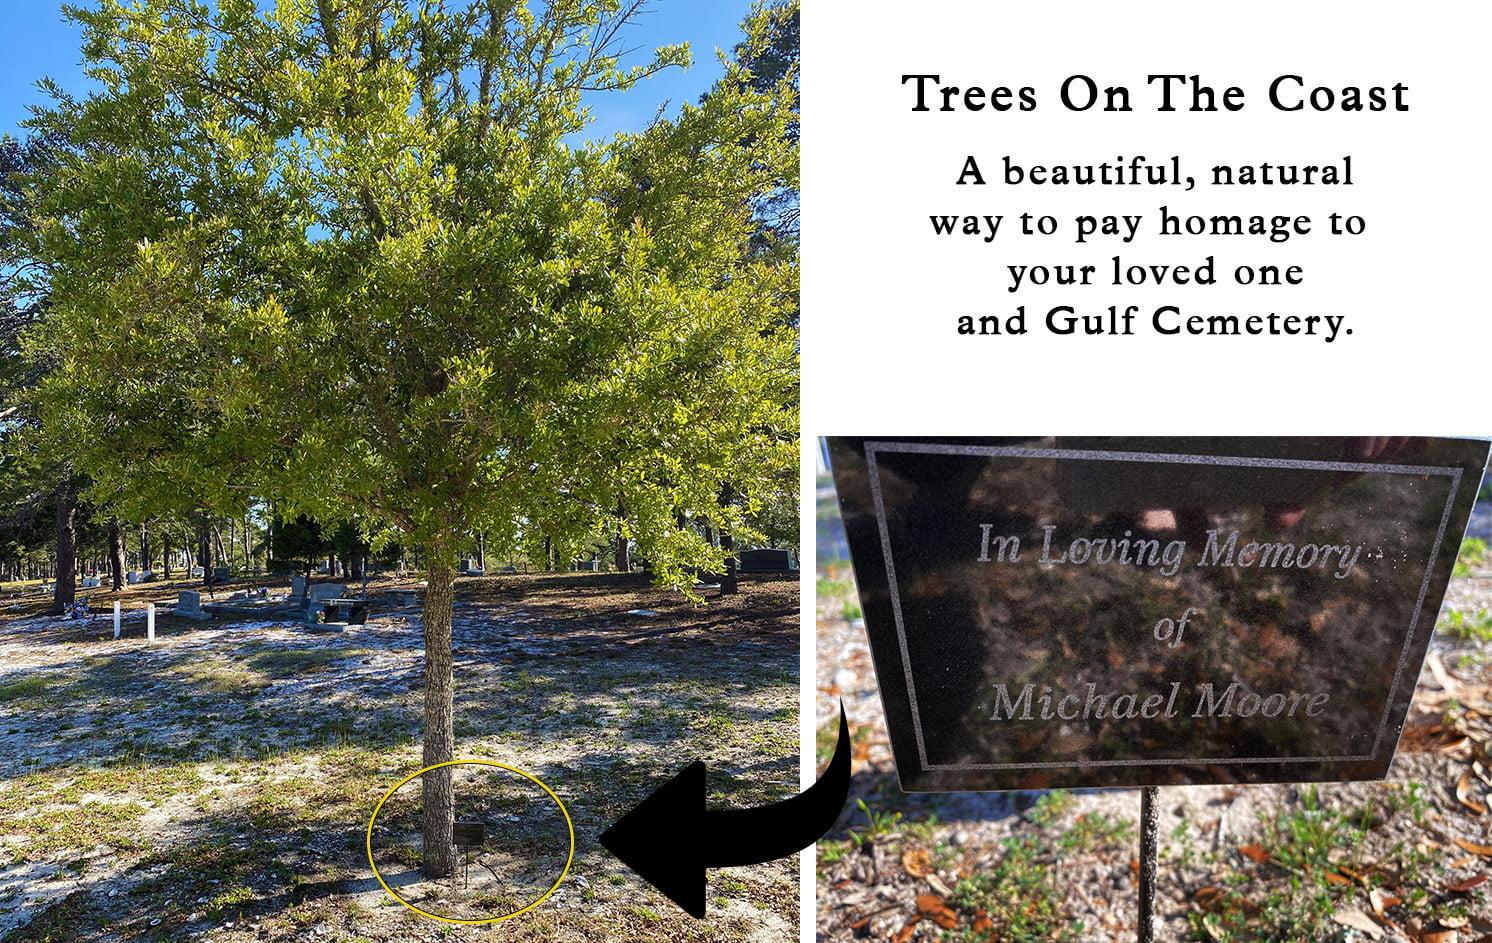 The Trees on the Coast Program